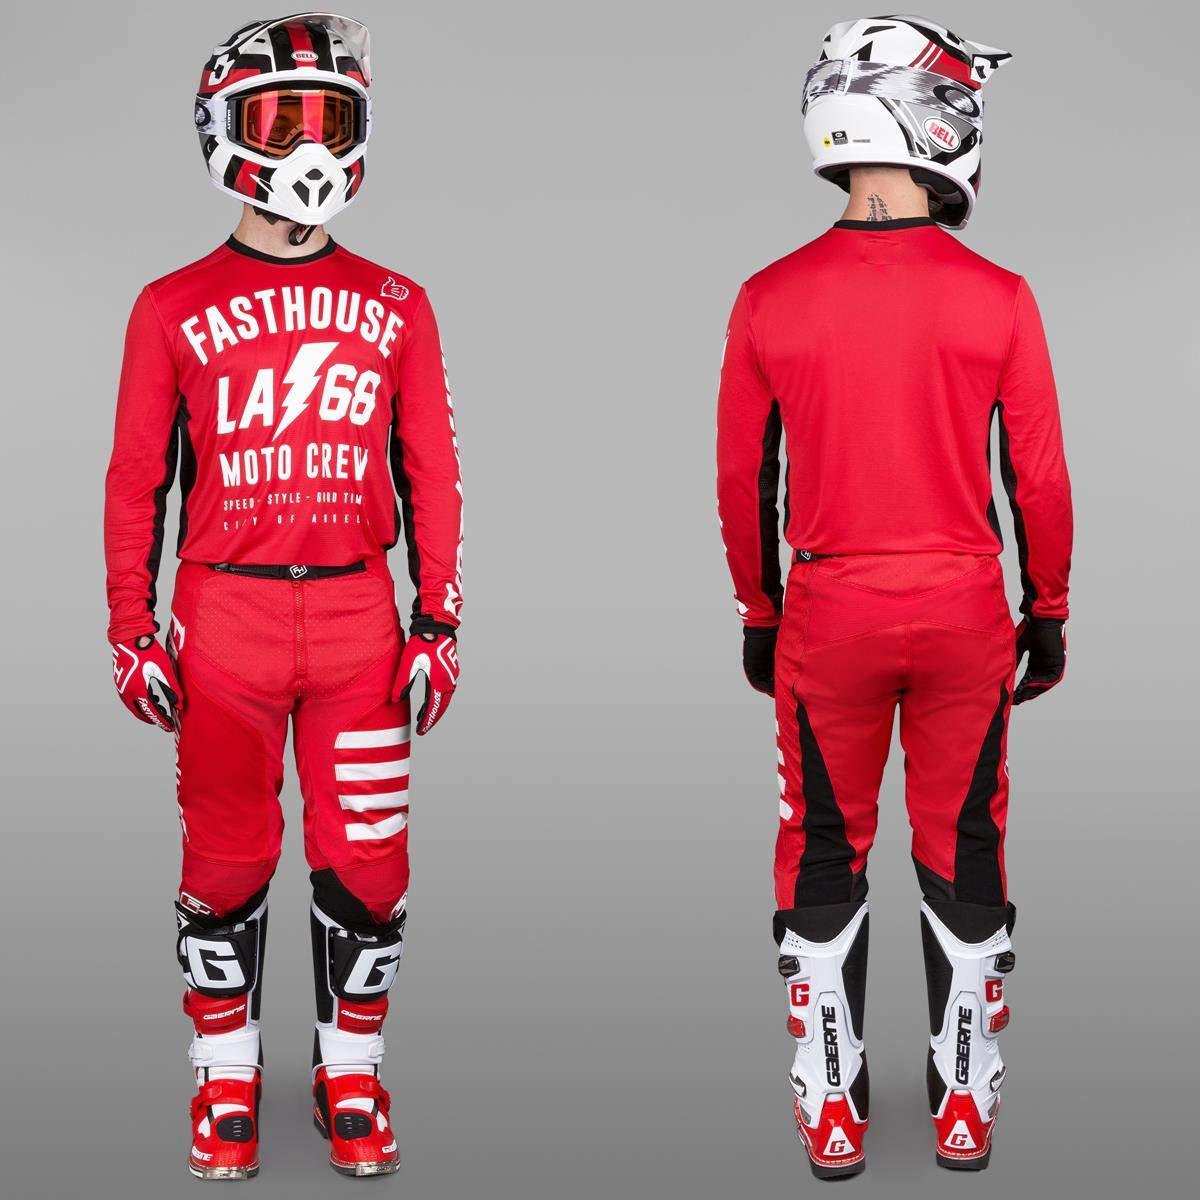 163dd846b Amazon.com  Grey Sz S Fasthouse FH LA 68 L1 Motocross Jersey  Automotive